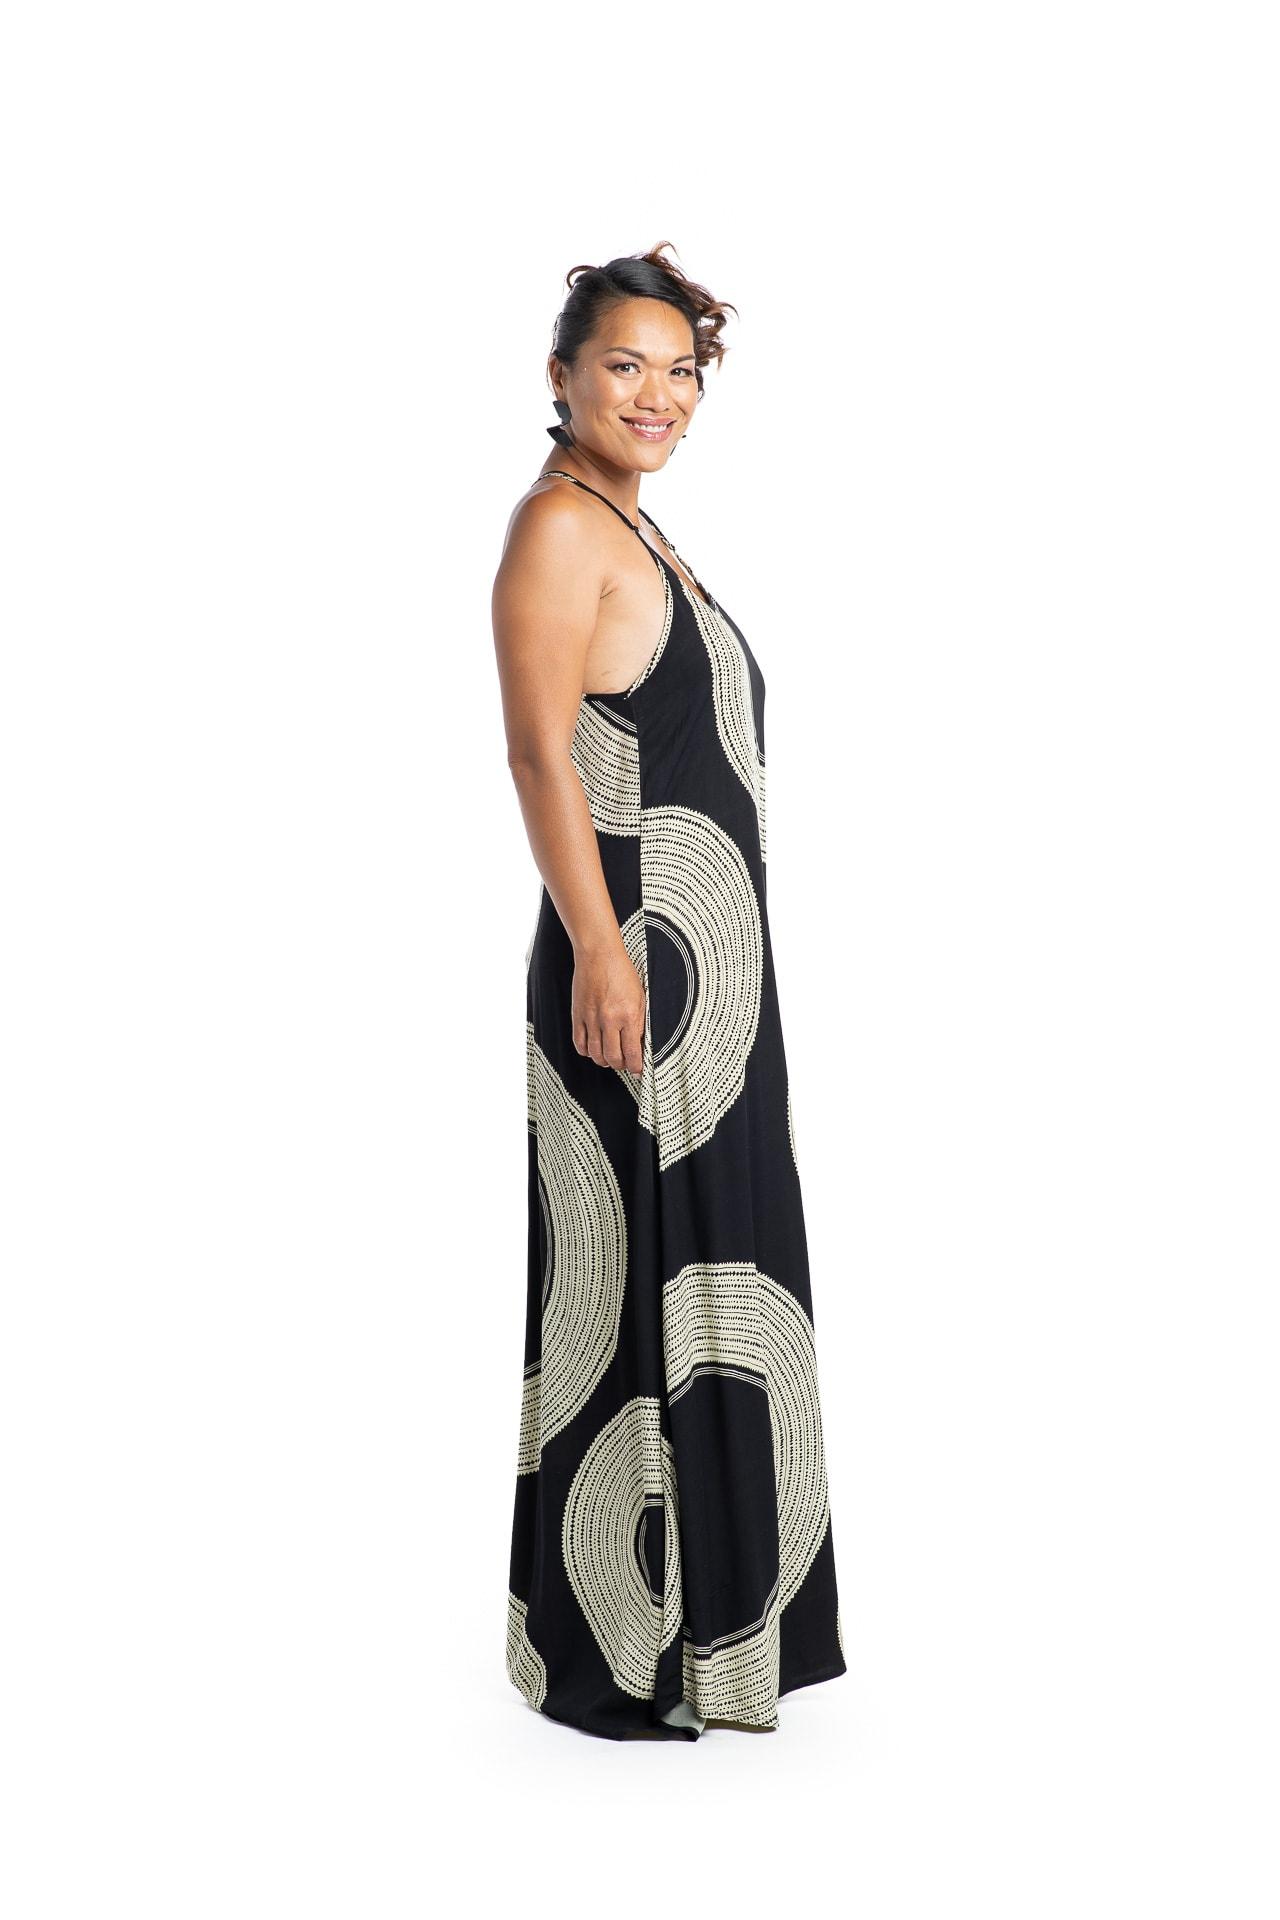 Model wearing Haili Dress - Side View